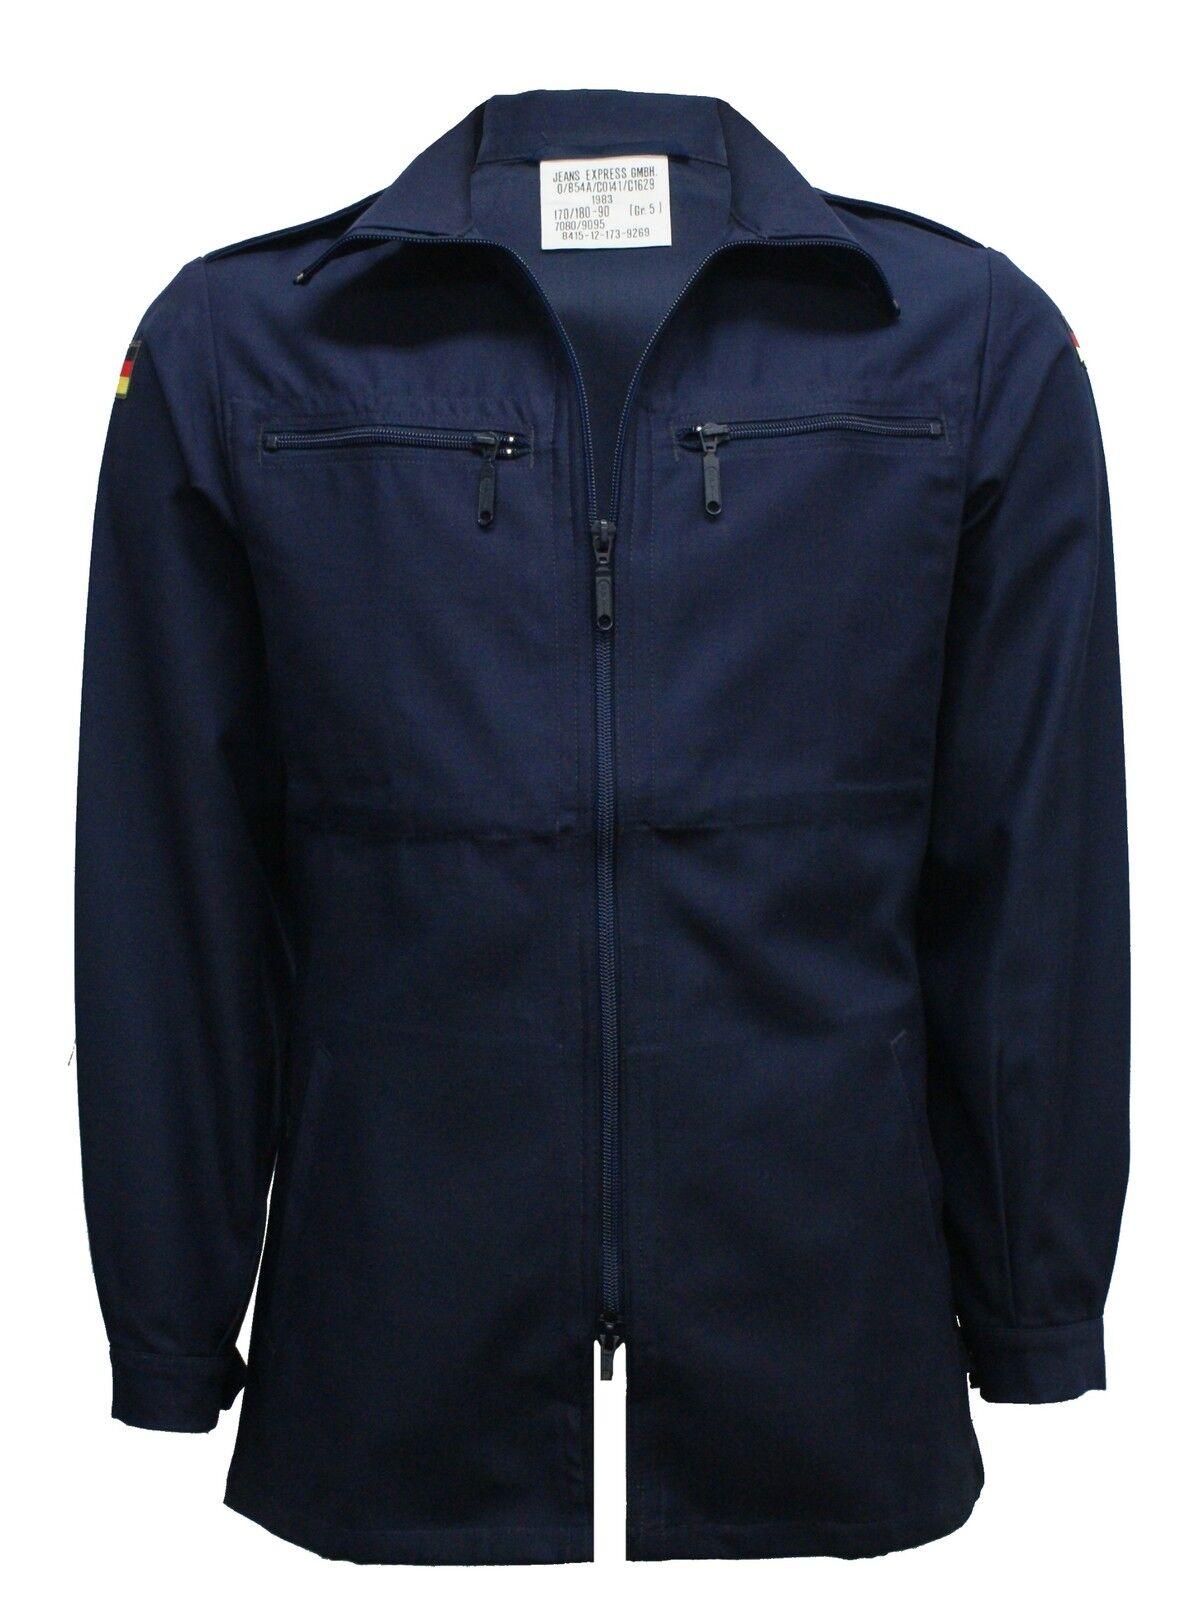 German Army Shirt Original Military Navy Blue Work Long Sleeve Zip Light Jacket